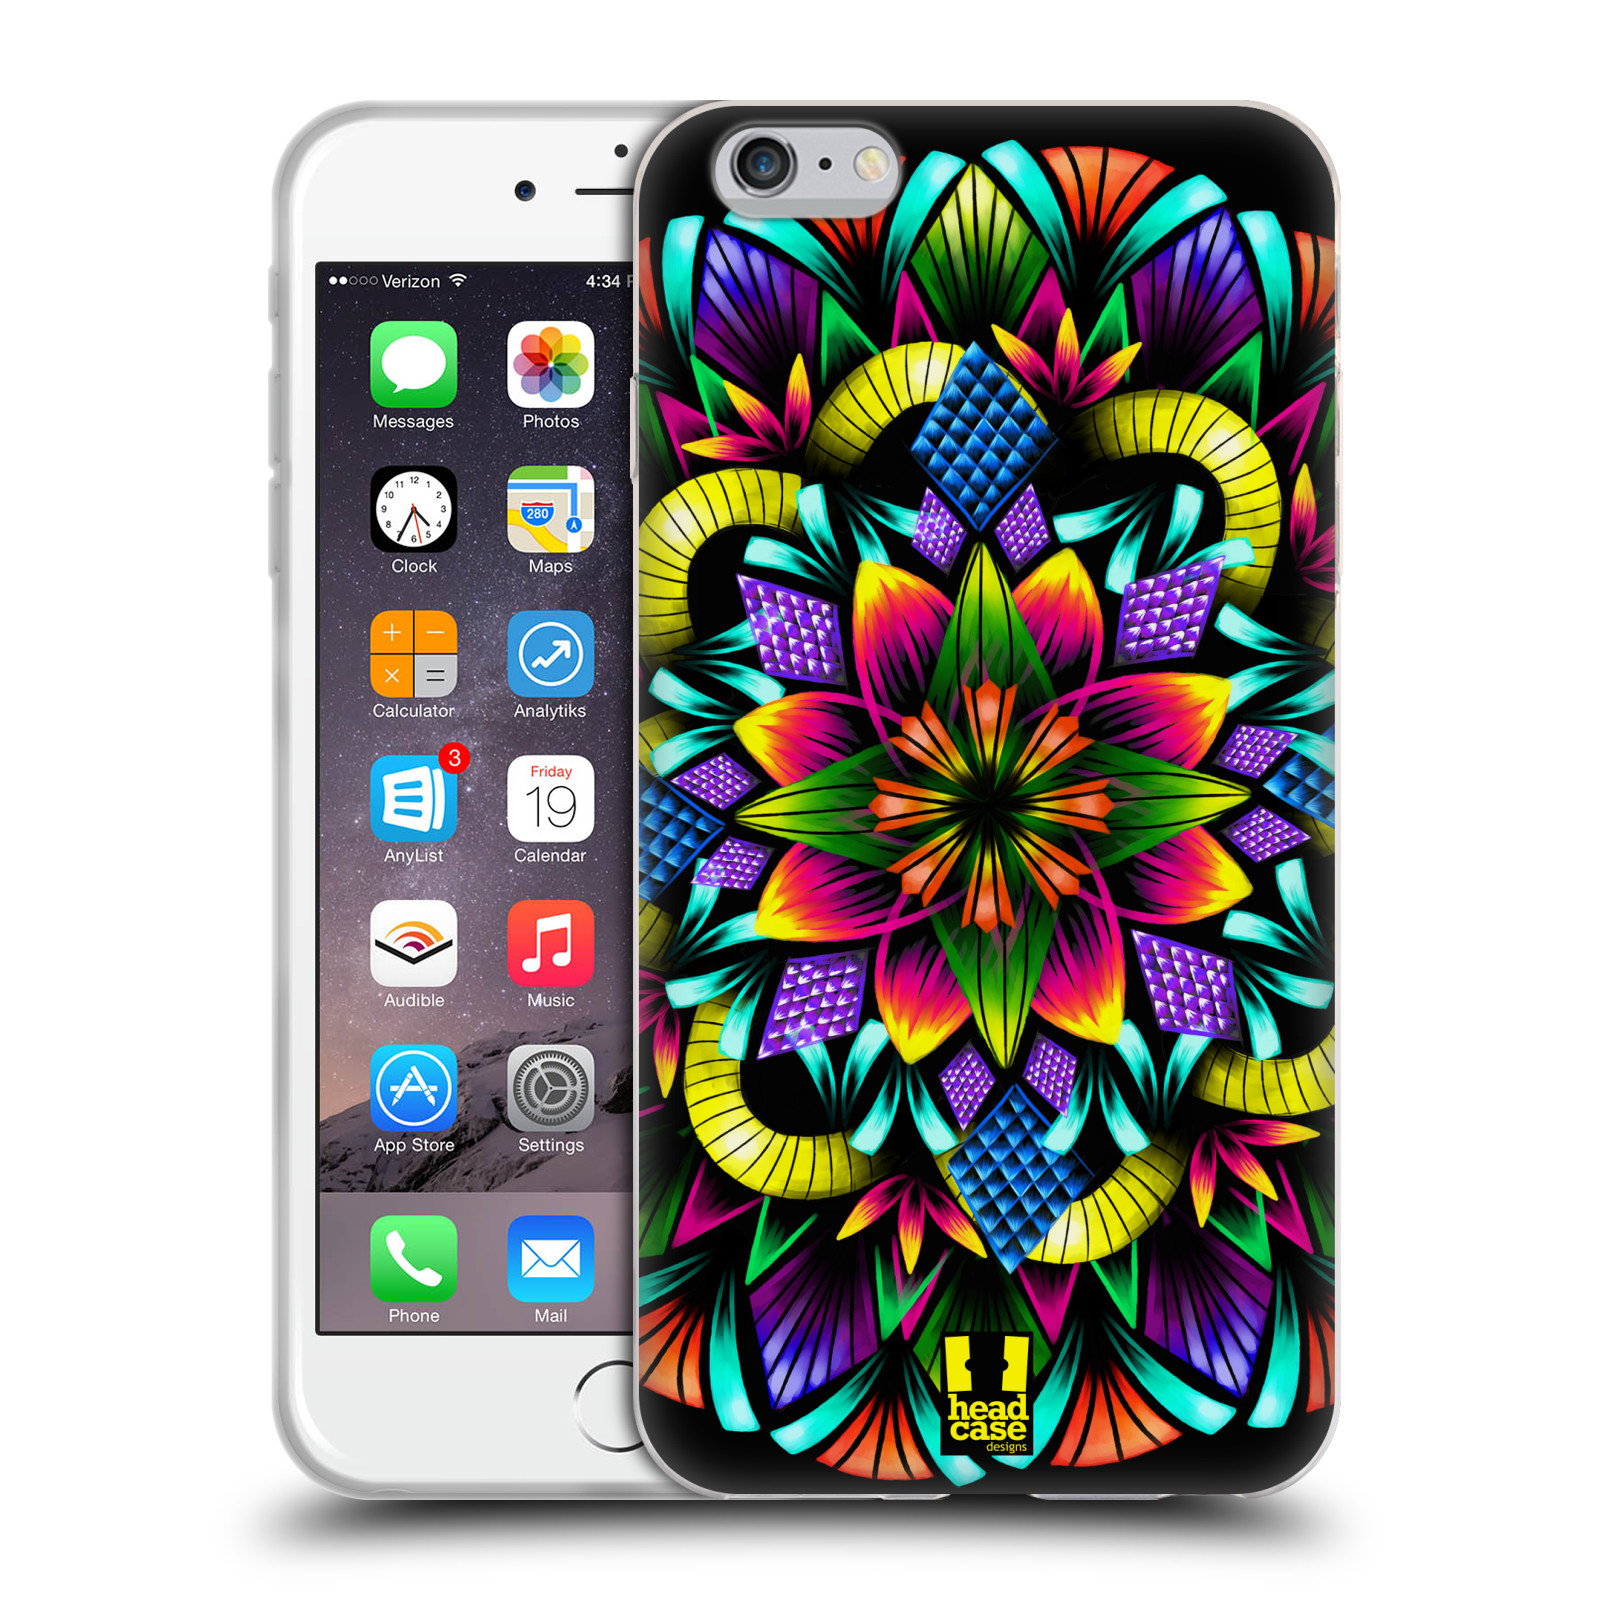 HEAD CASE silikonový obal na mobil Apple Iphone 6 PLUS/ 6S PLUS vzor Indie Mandala kaleidoskop barevný vzor KVĚTINA